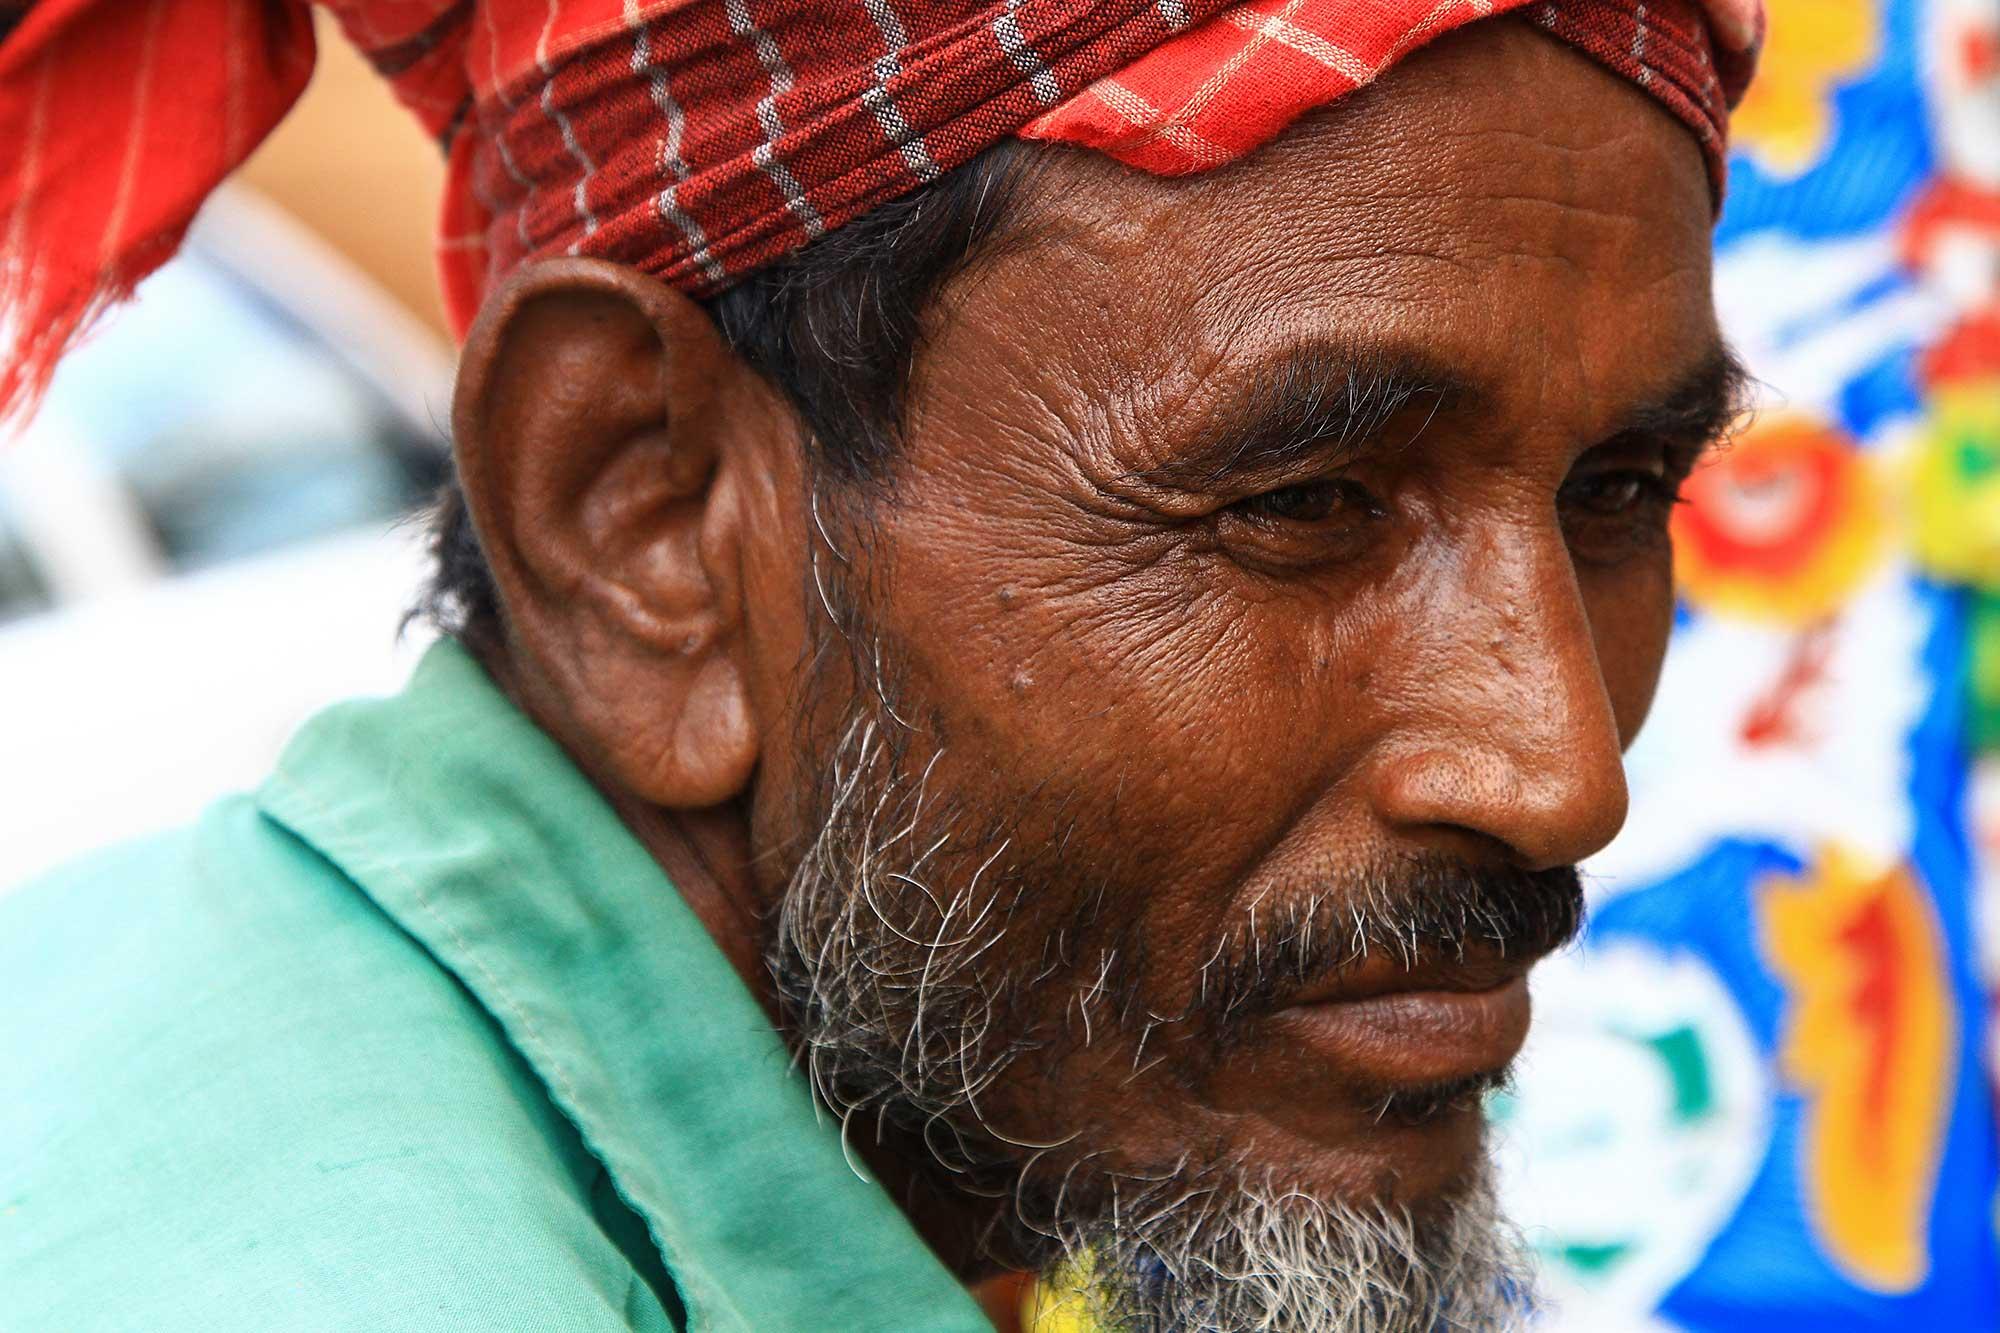 portrait-rikscha-driver-dhaka-bangladesh